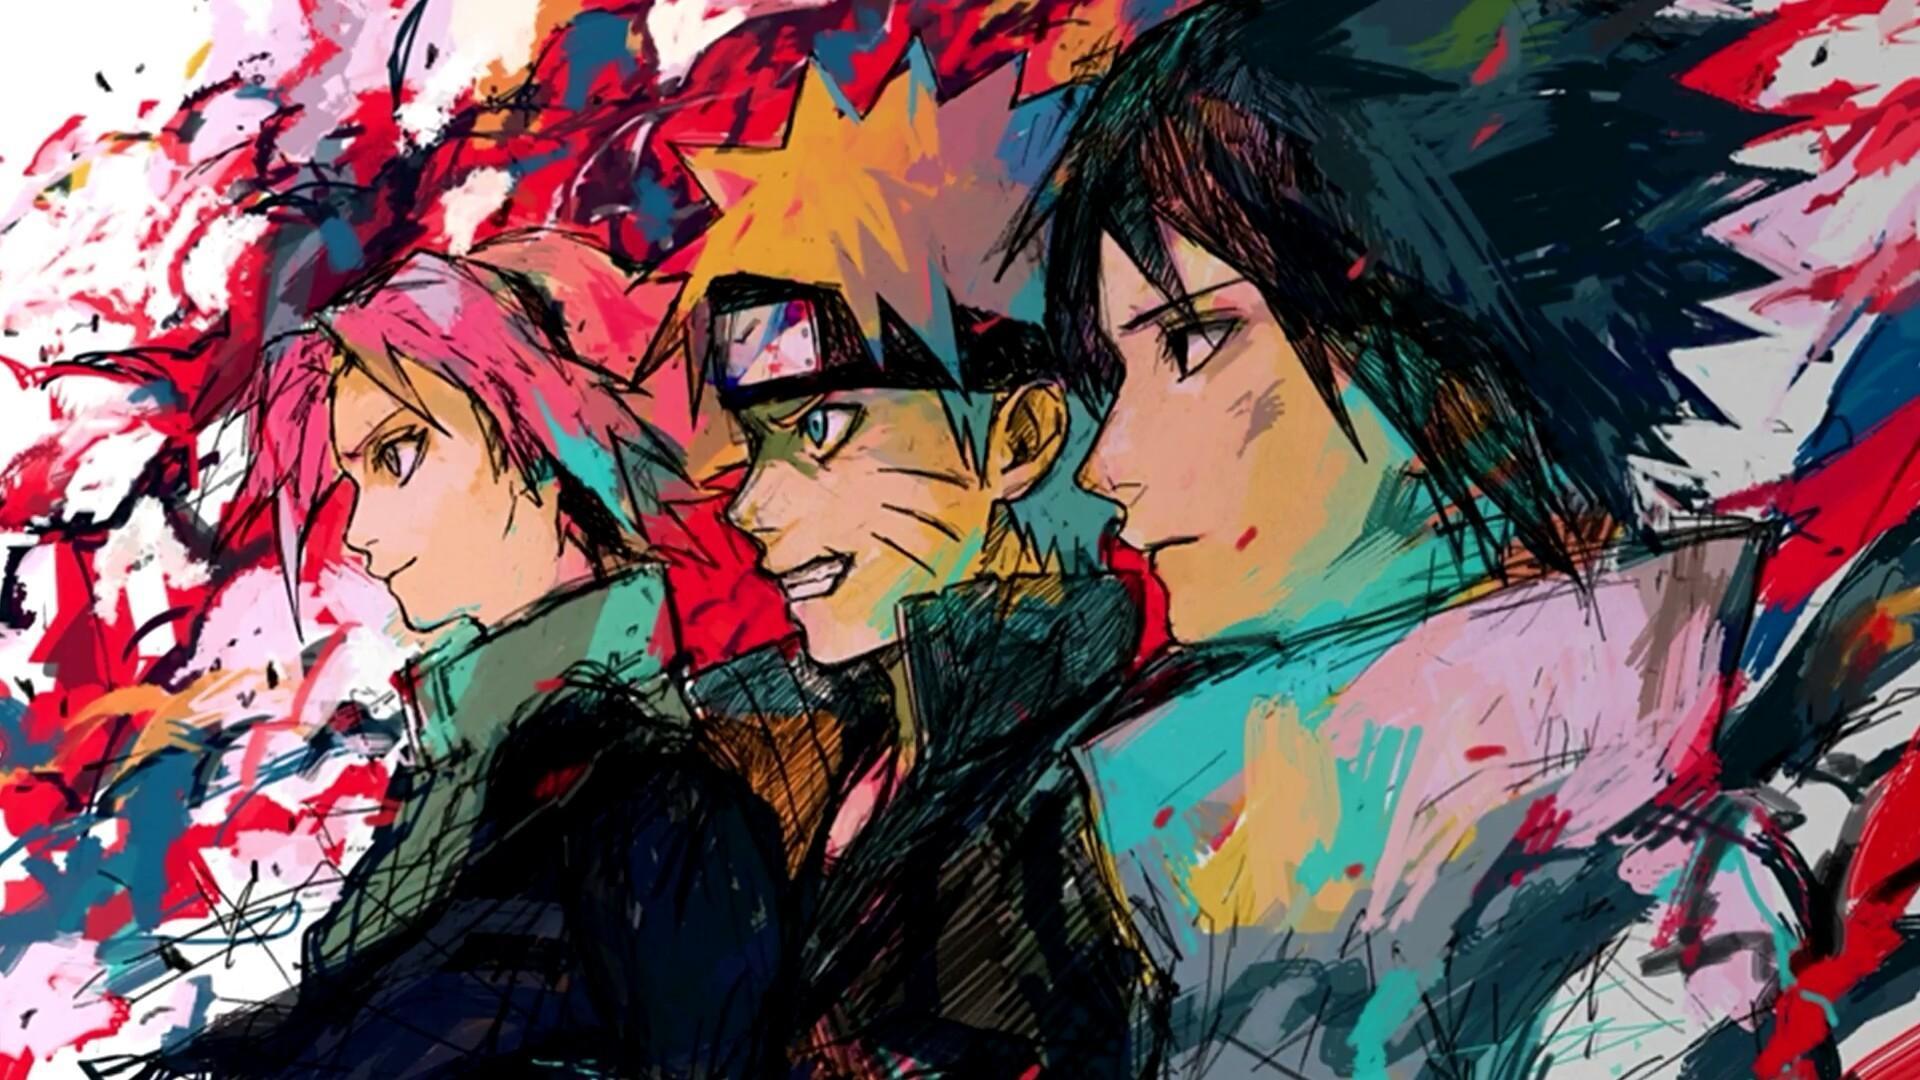 Naruto Anime Laptop Wallpapers Top Free Naruto Anime Laptop Backgrounds Wallpaperaccess